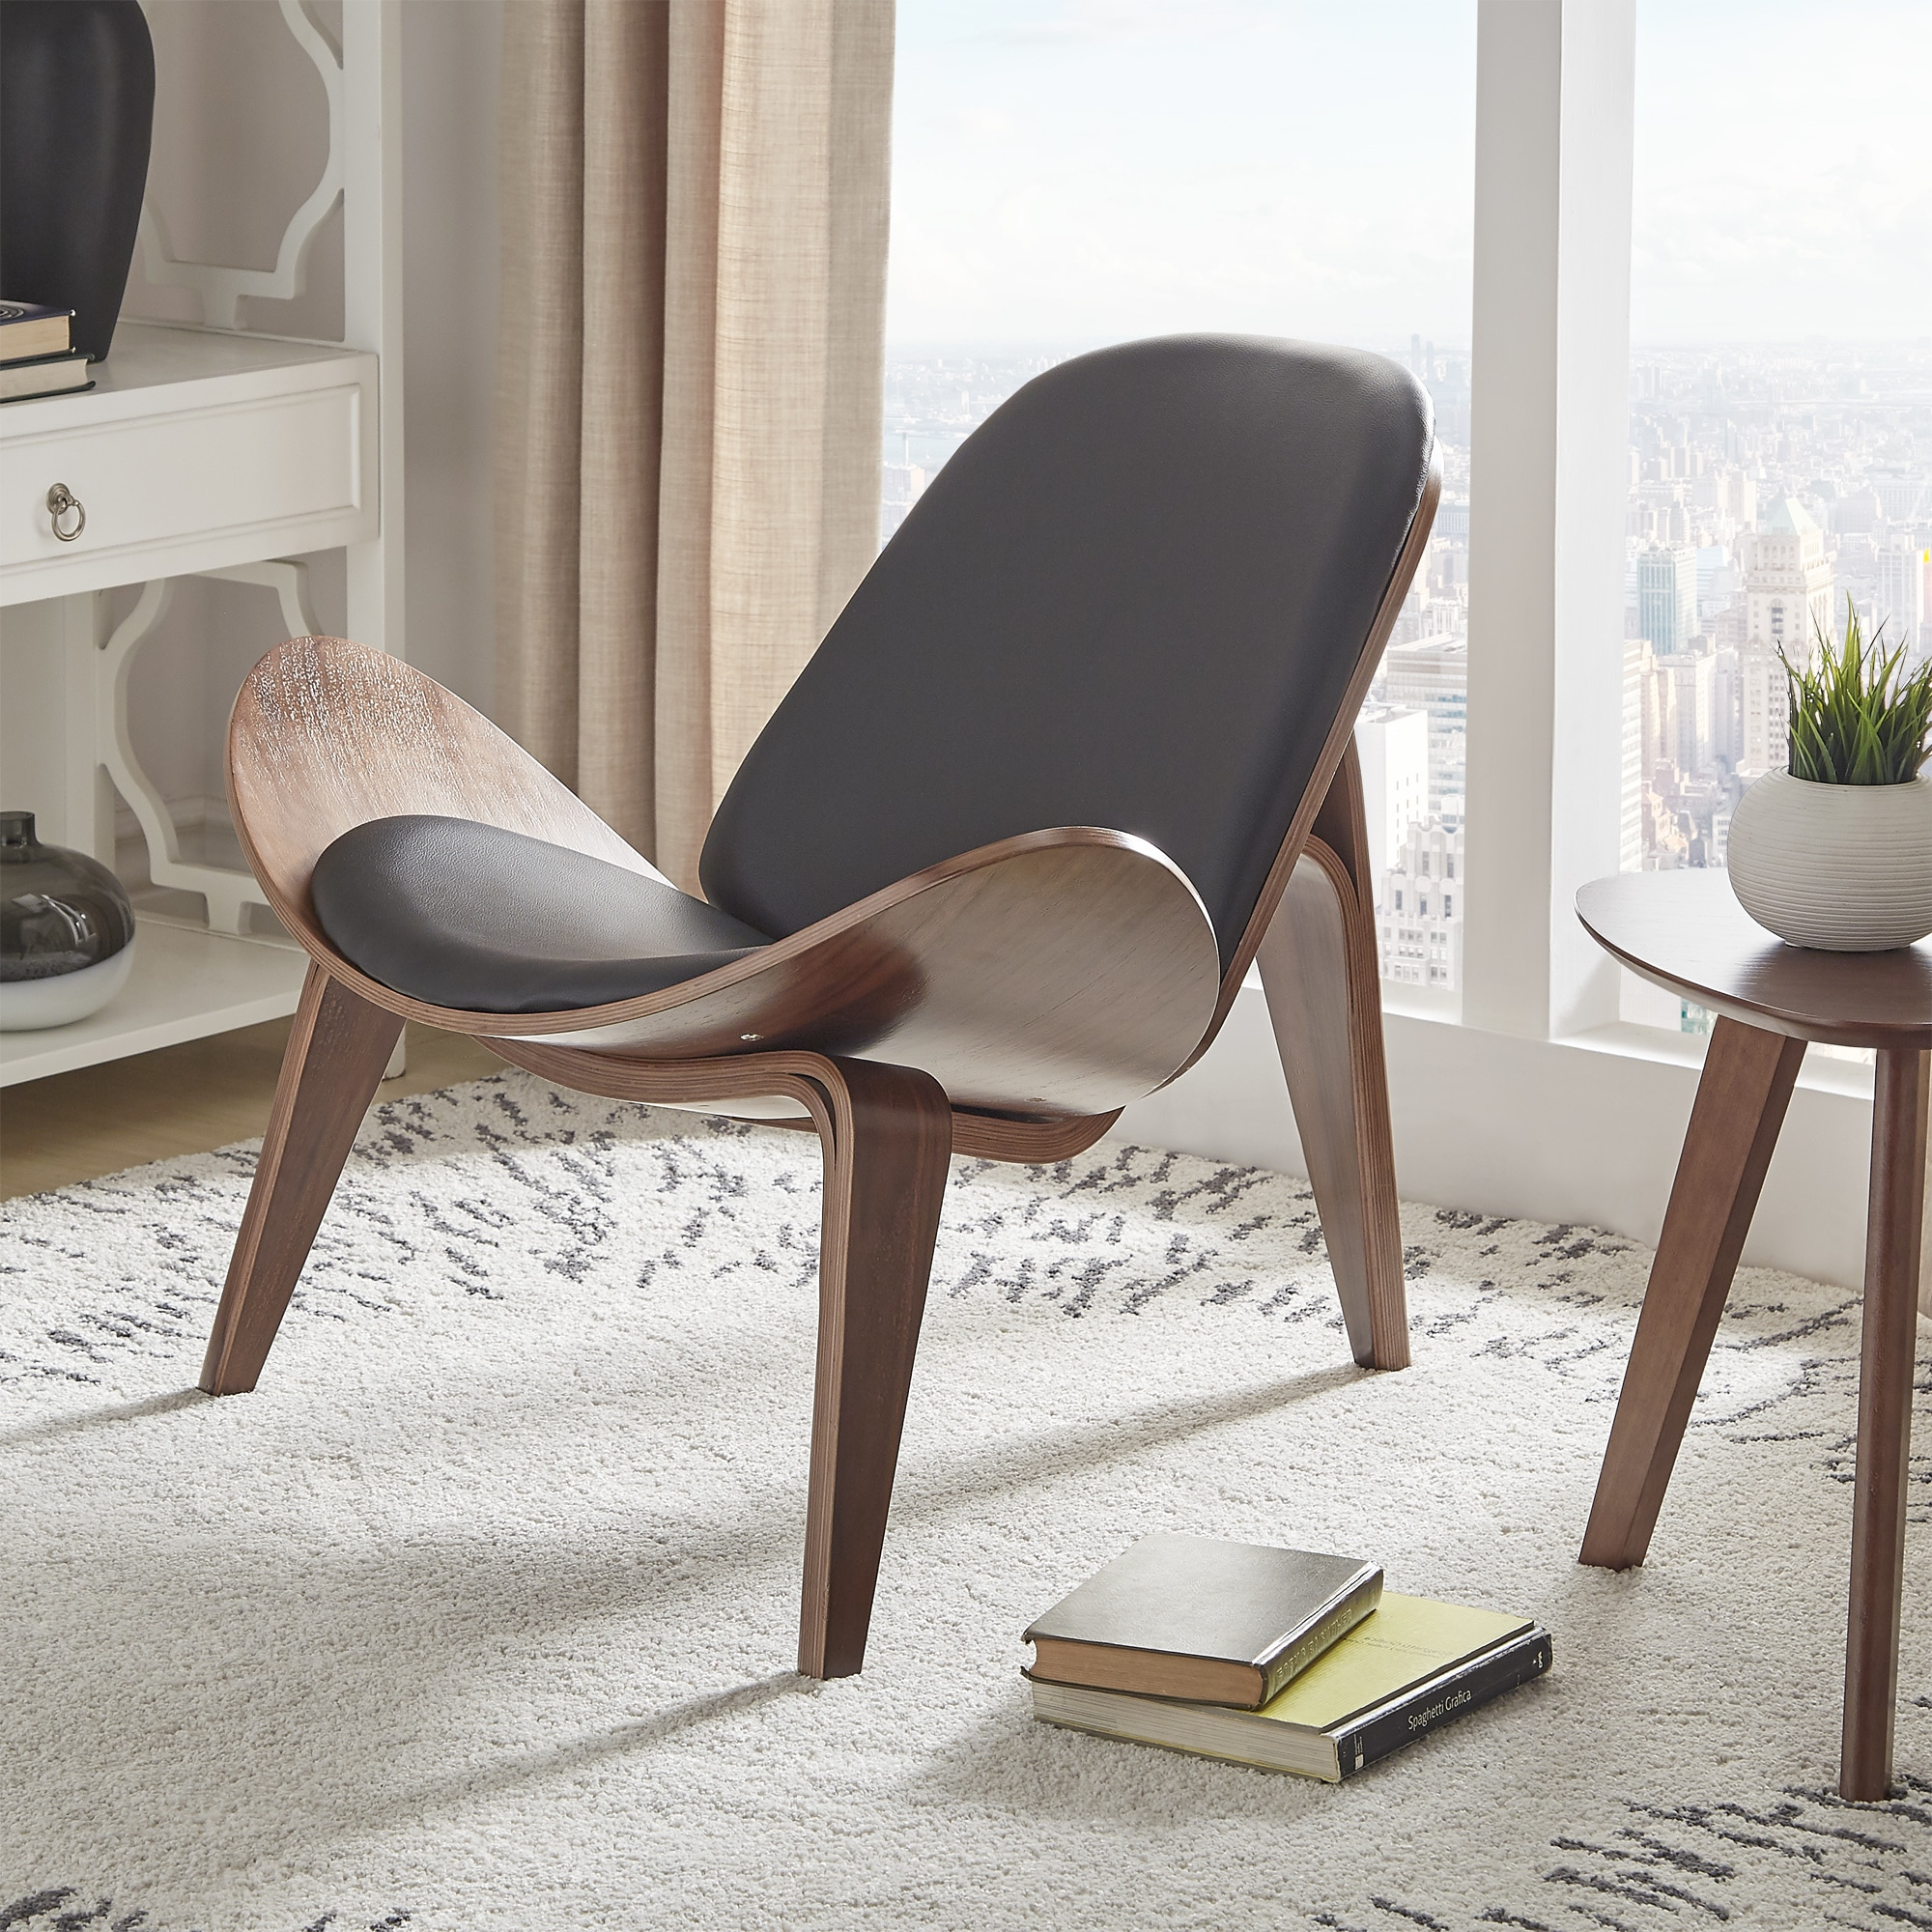 Scandinavian Walnut Retro Modern Shell Accent Chair Small Furniture Office  Home